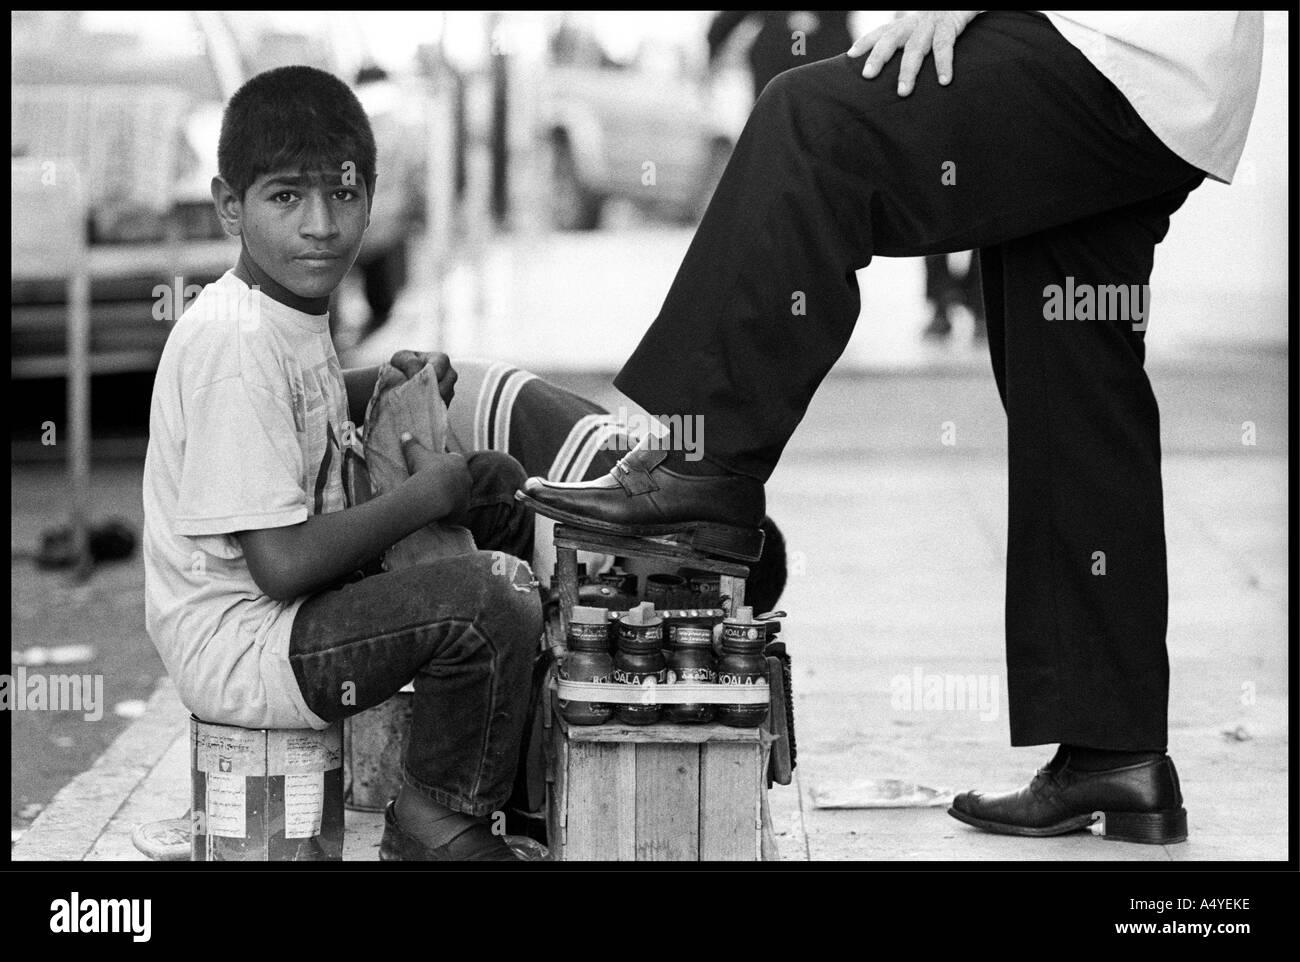 Shoeshine Boy High Resolution Stock